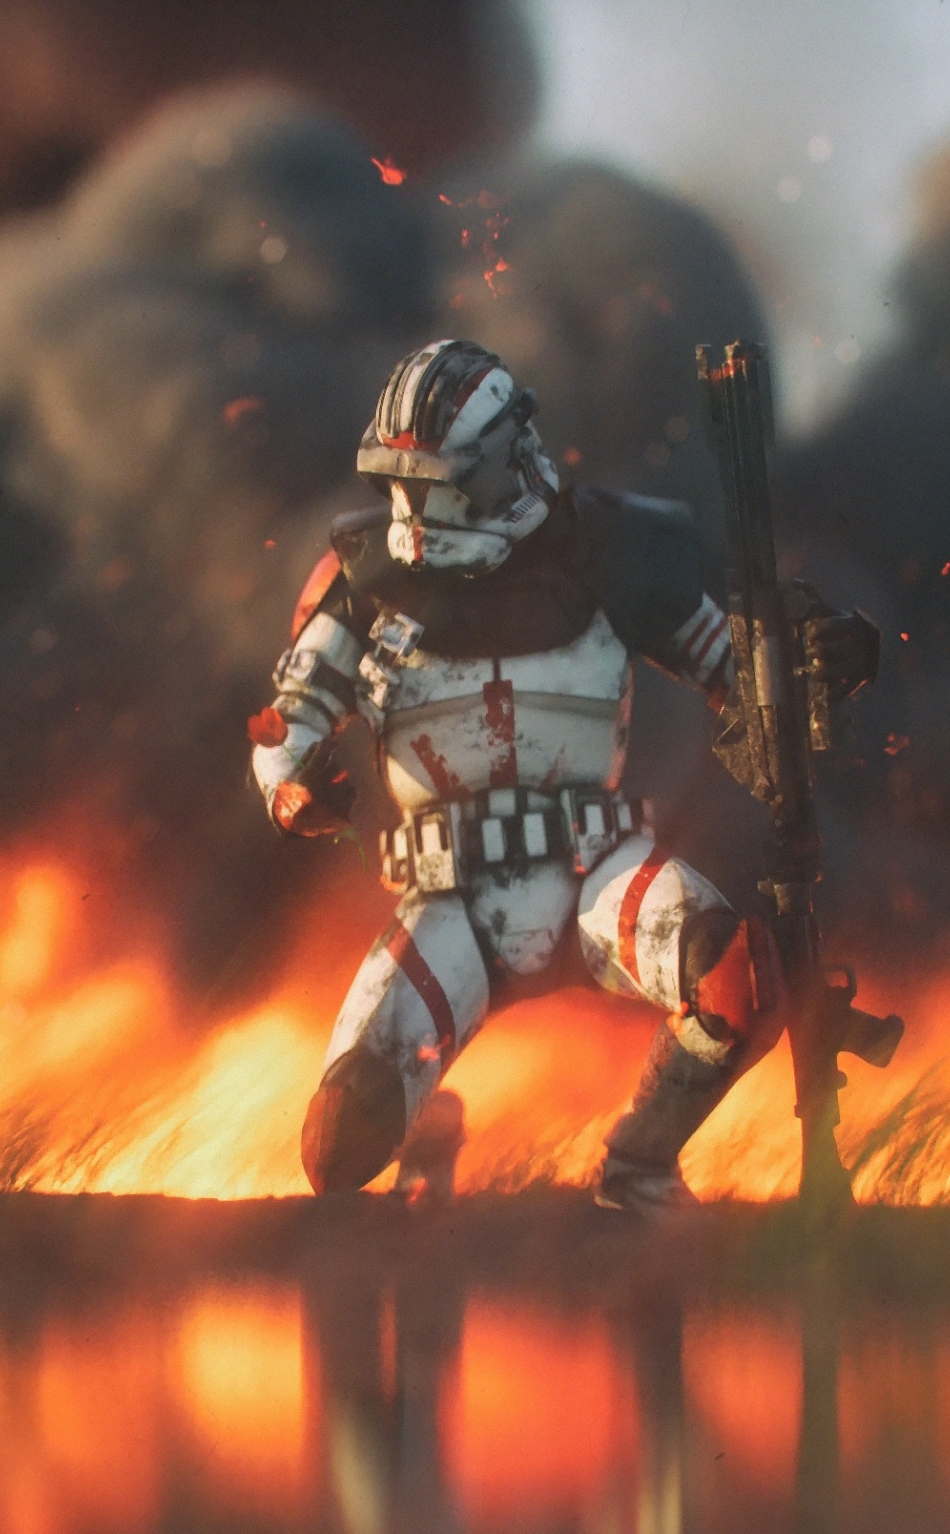 Download 950x1534 Wallpaper Clone Trooper Star Wars Fire Iphone